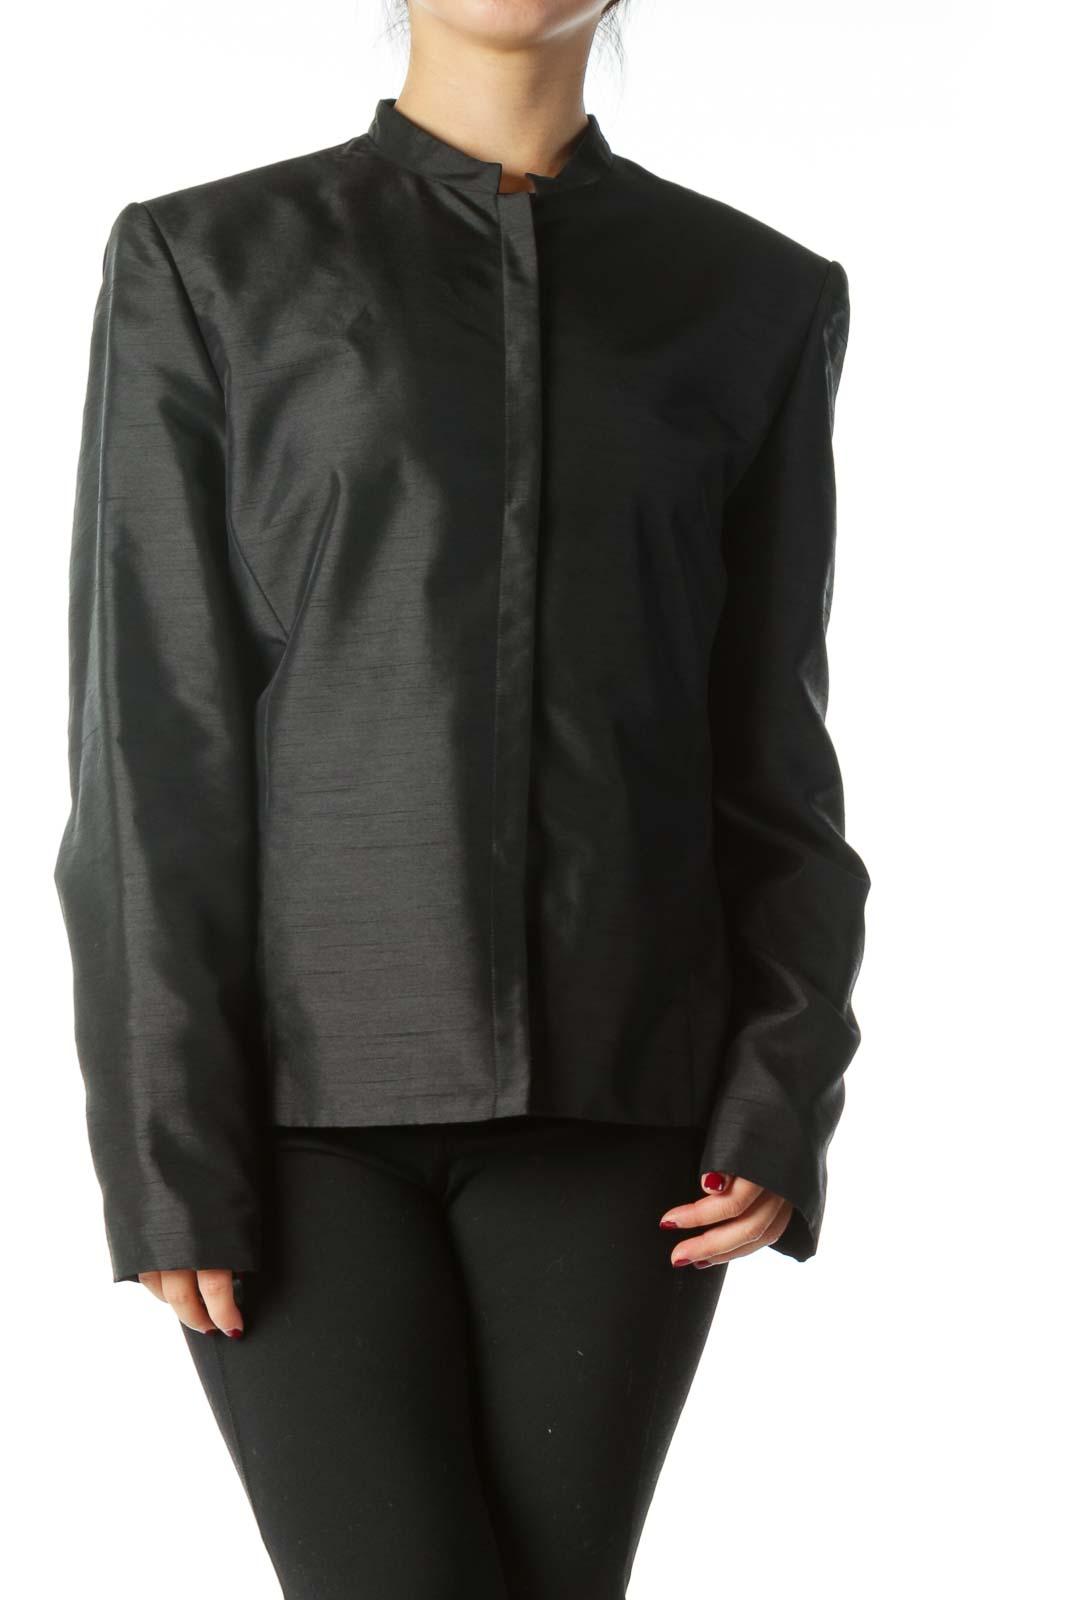 Black Textured Suit Jacket Front